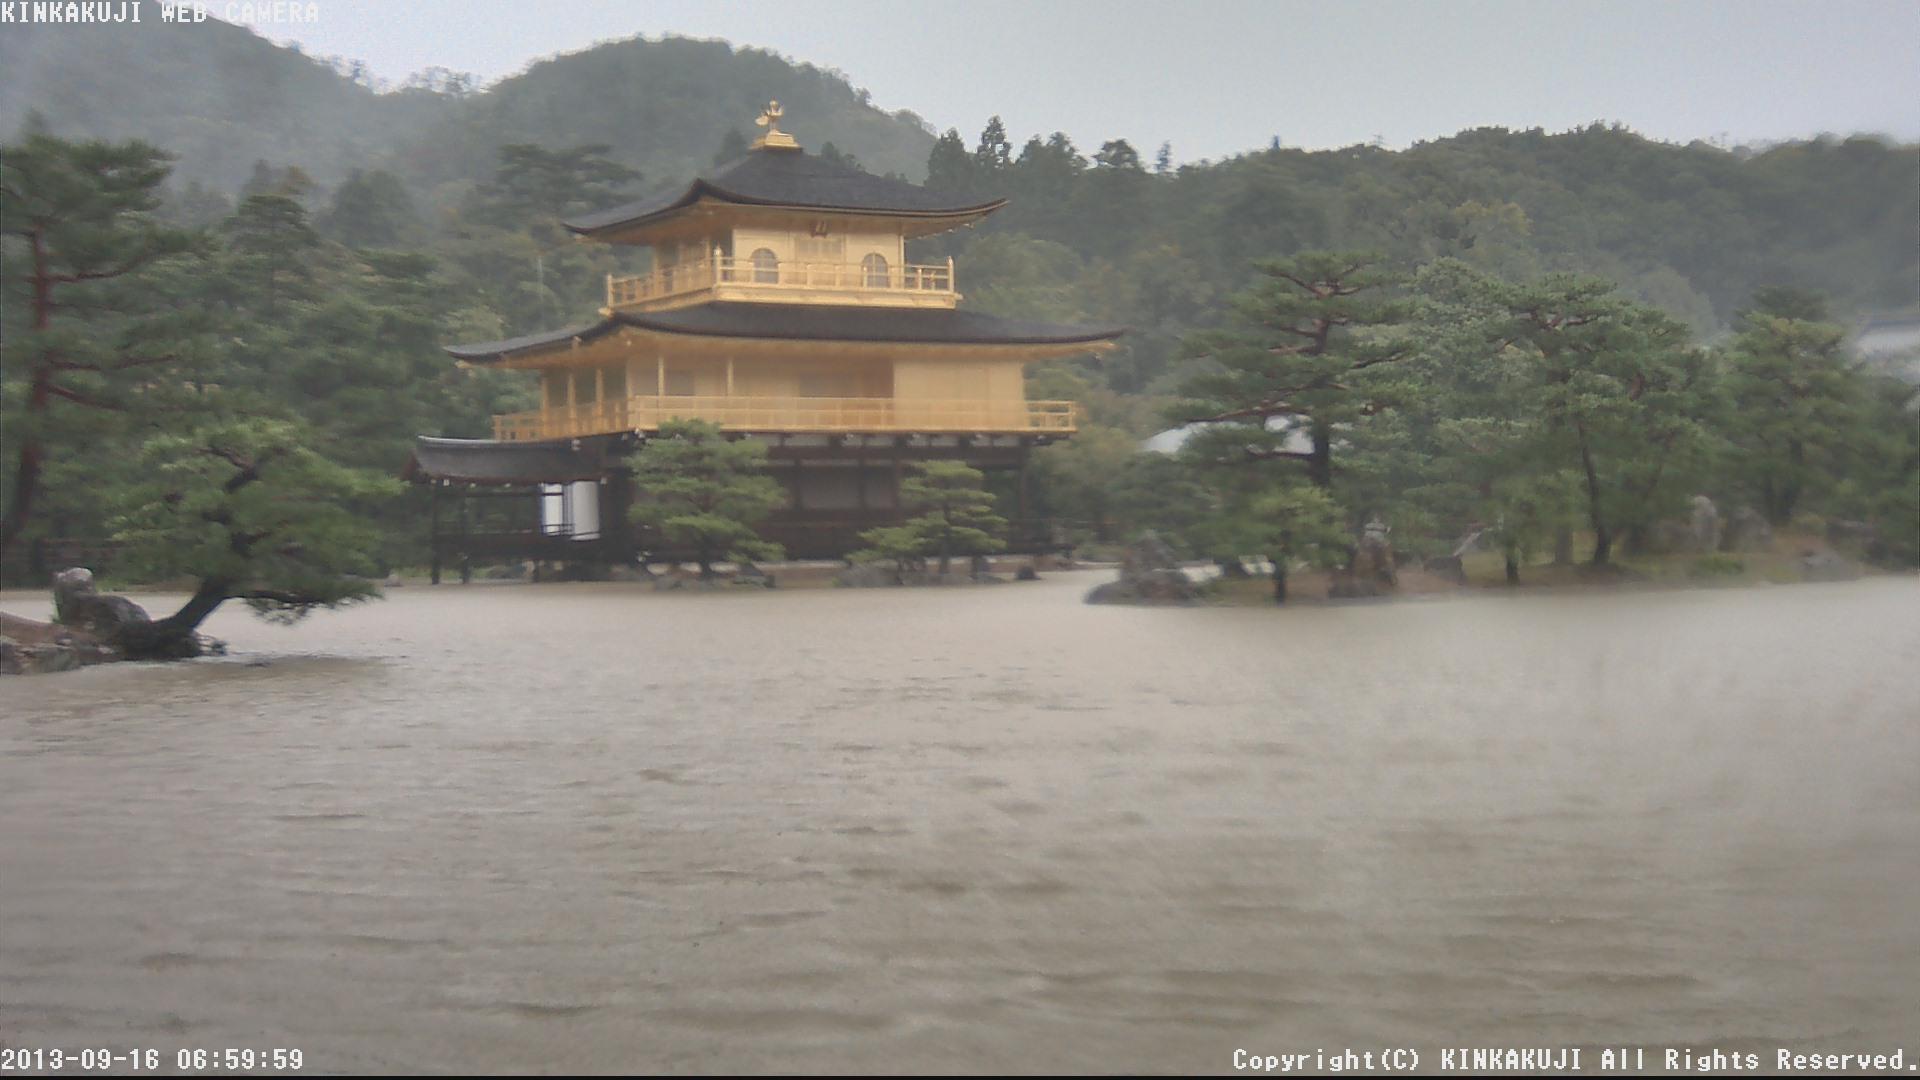 Kinkakuji with flooded pond